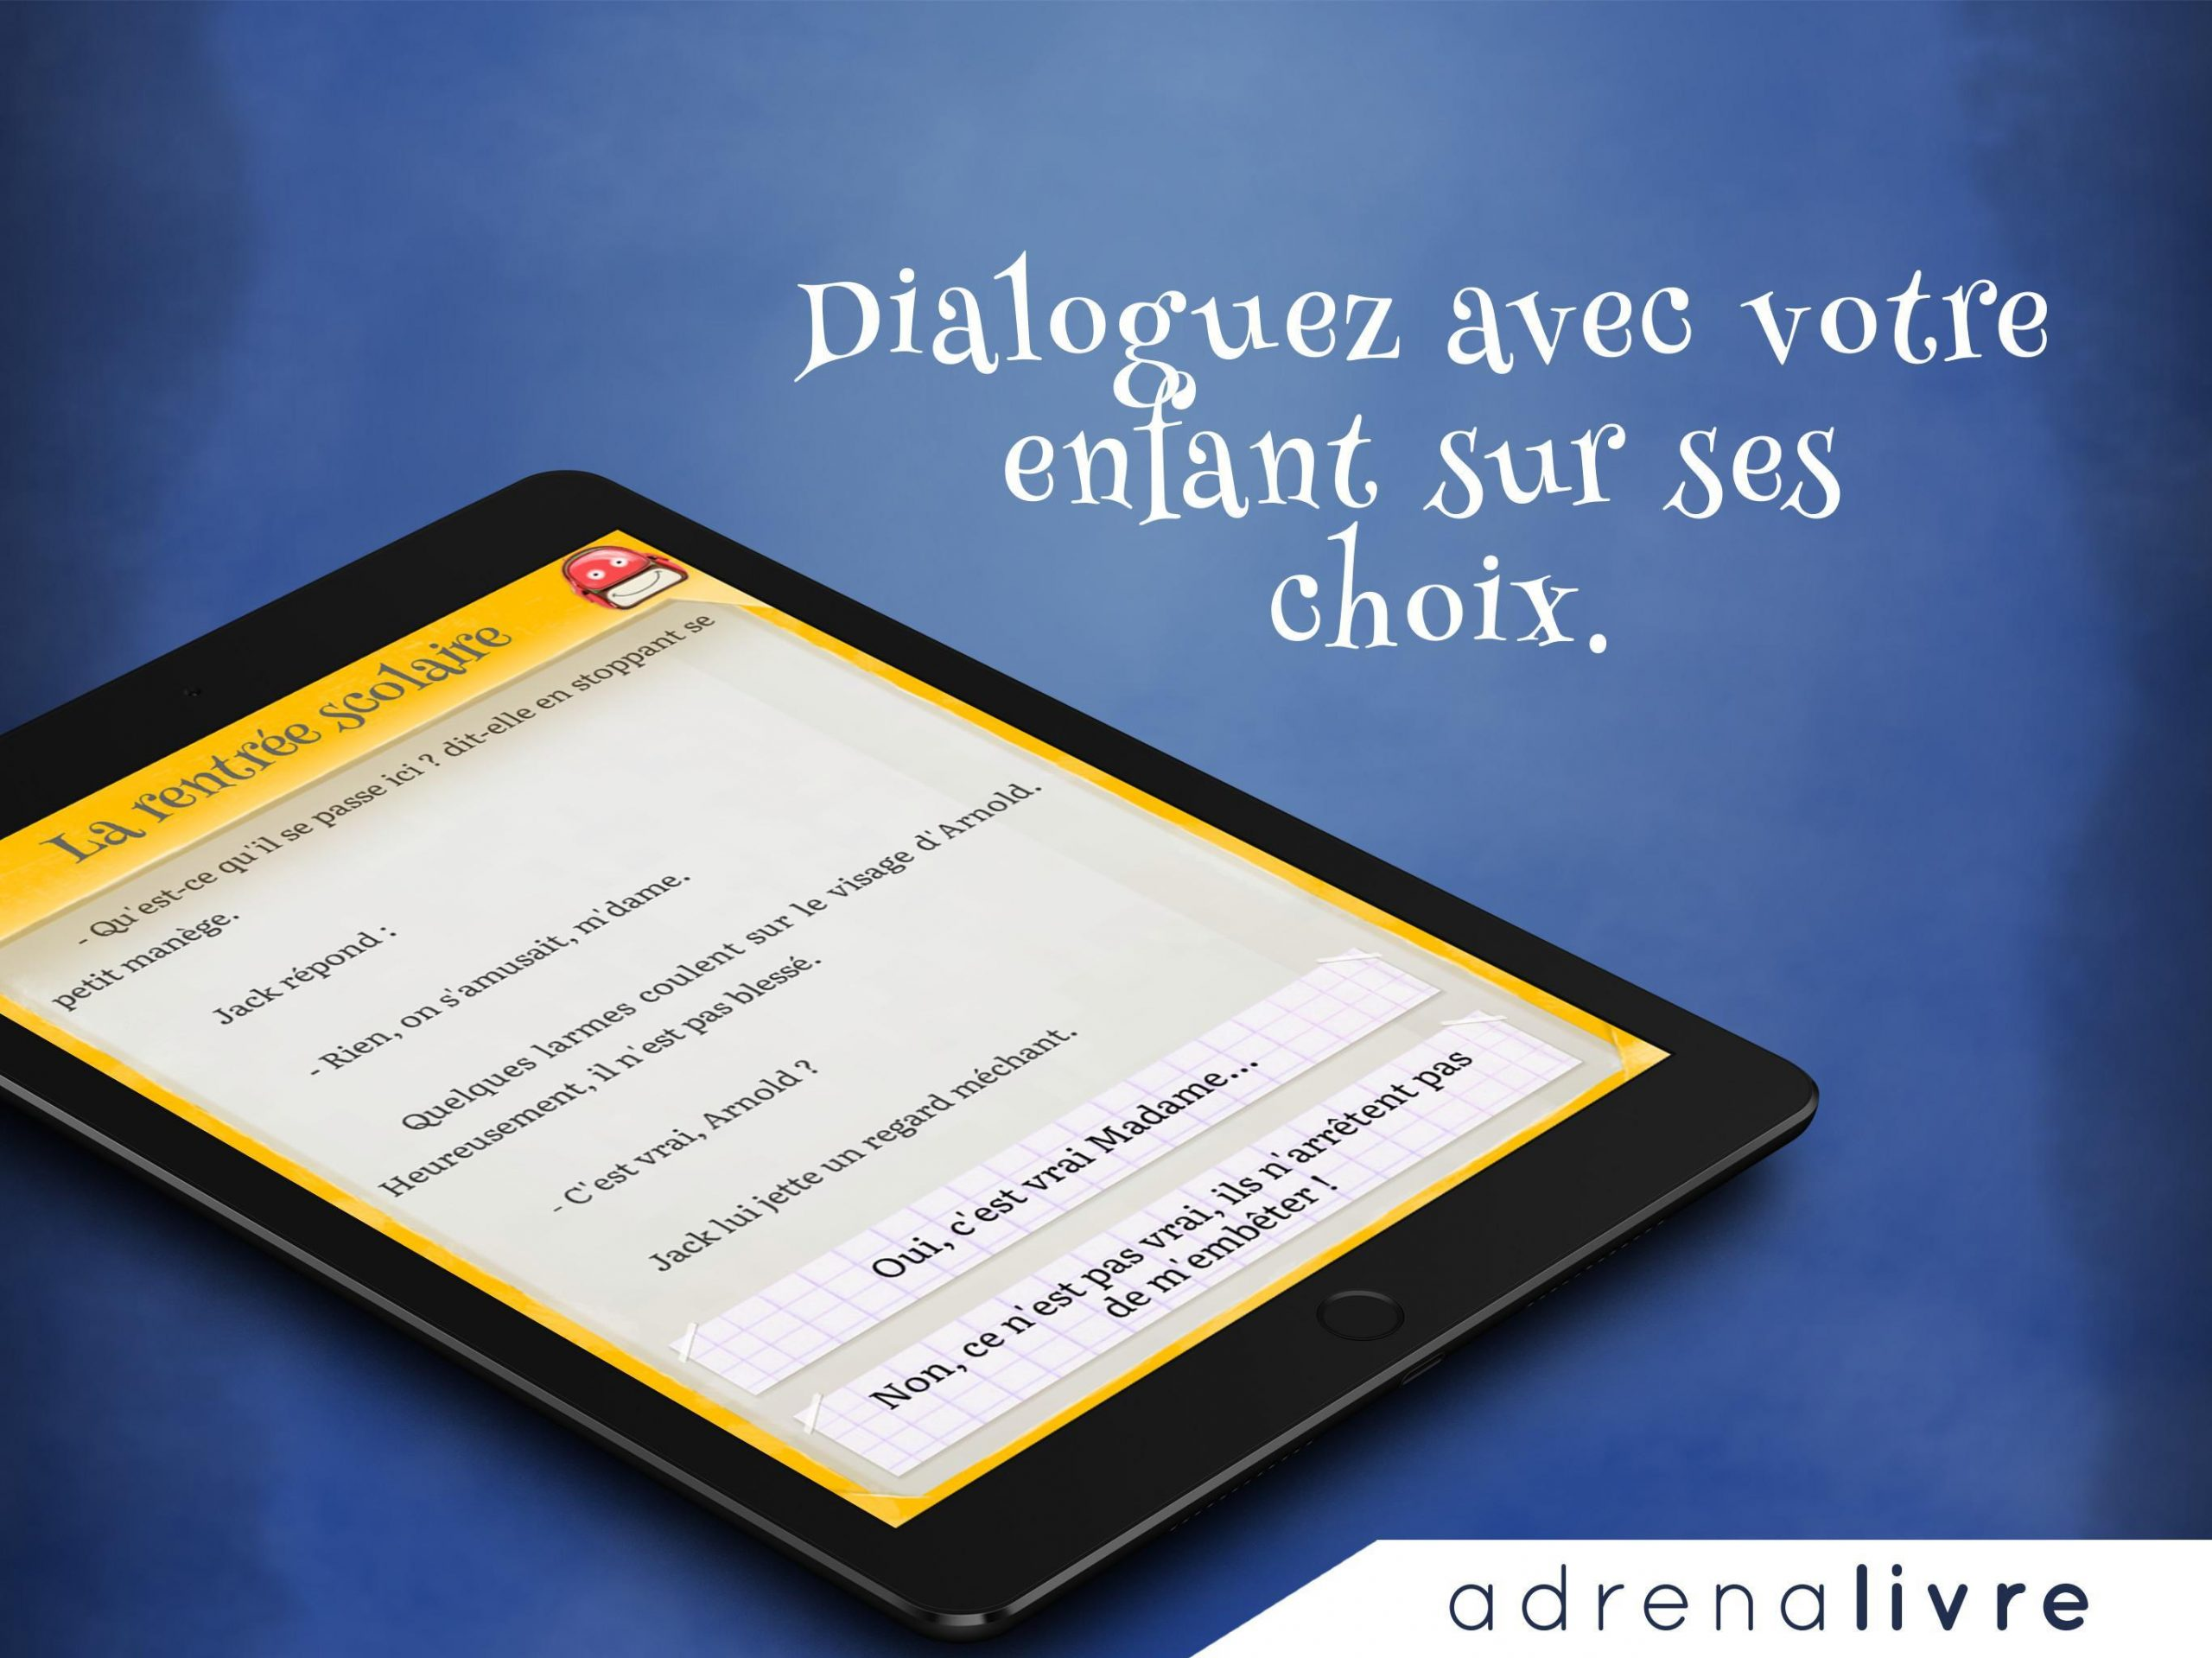 Arnold Et L'élixir Perdu, Livre-Jeu Interactif For Android concernant Jeu Interactif Enfant